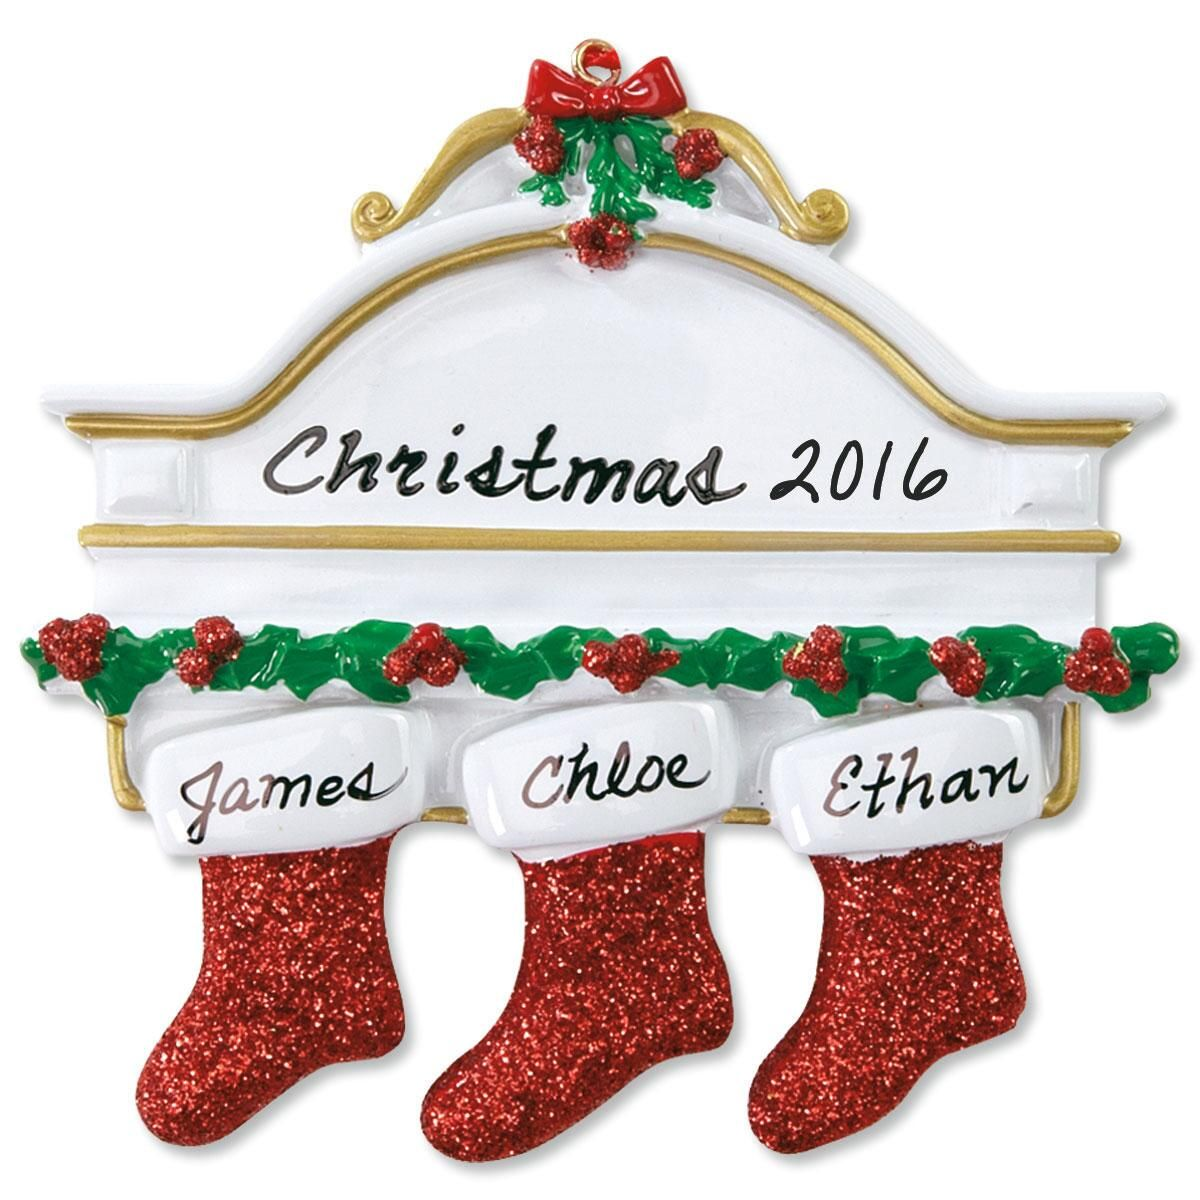 Mantel Stocking Ornaments